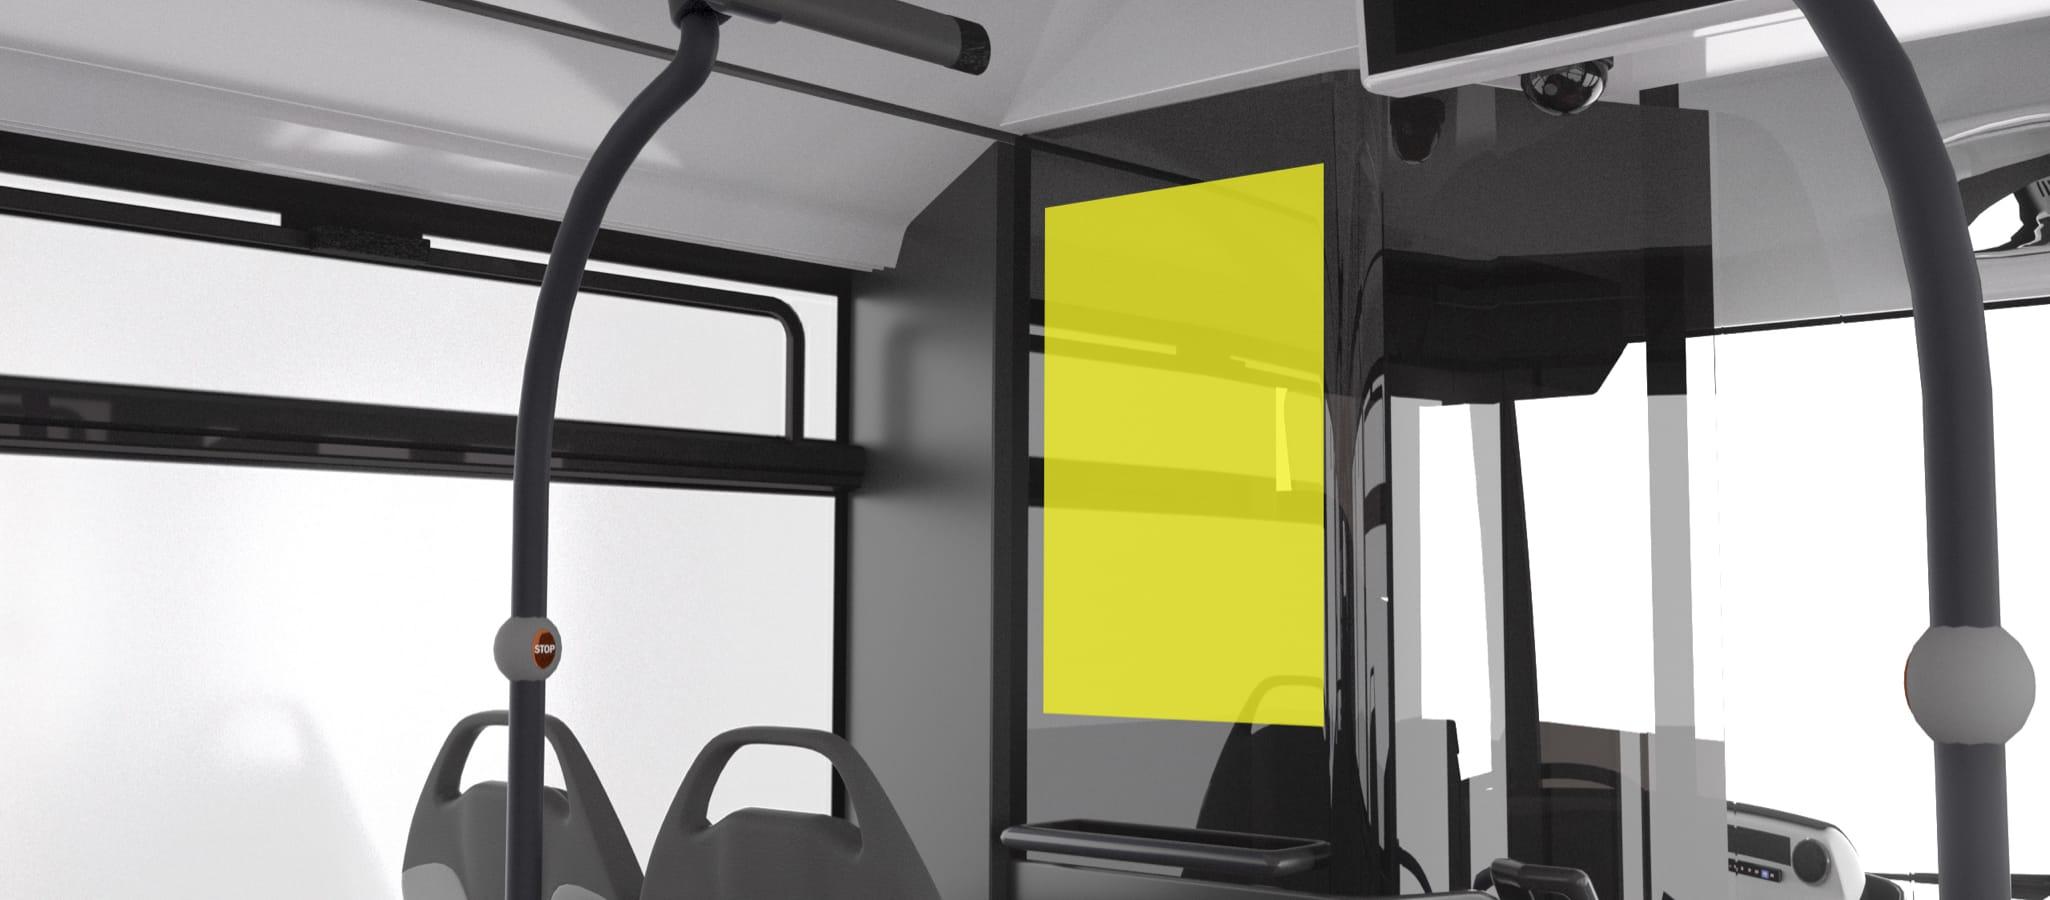 02_KWS-Buswerbung-Innenplakat